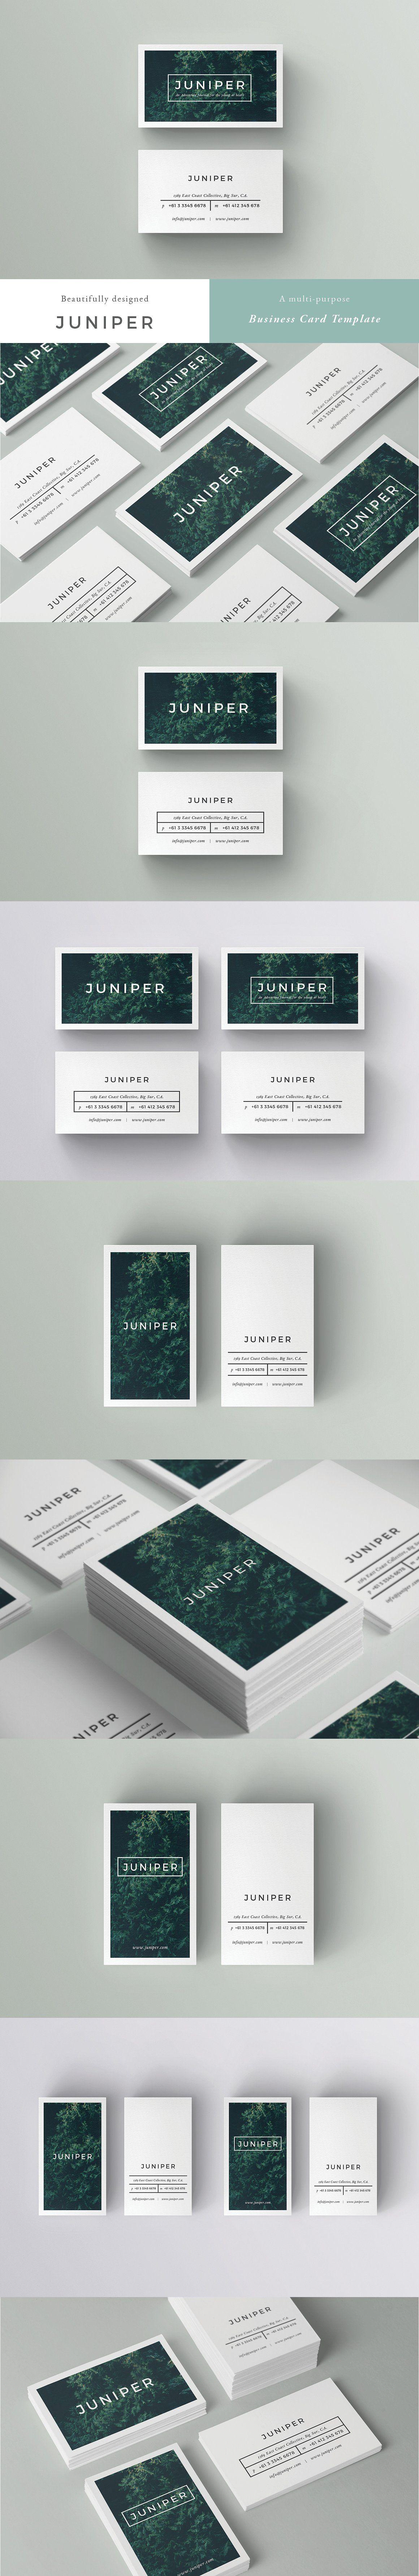 J U N I P E R Business Card Template Card Templates Business